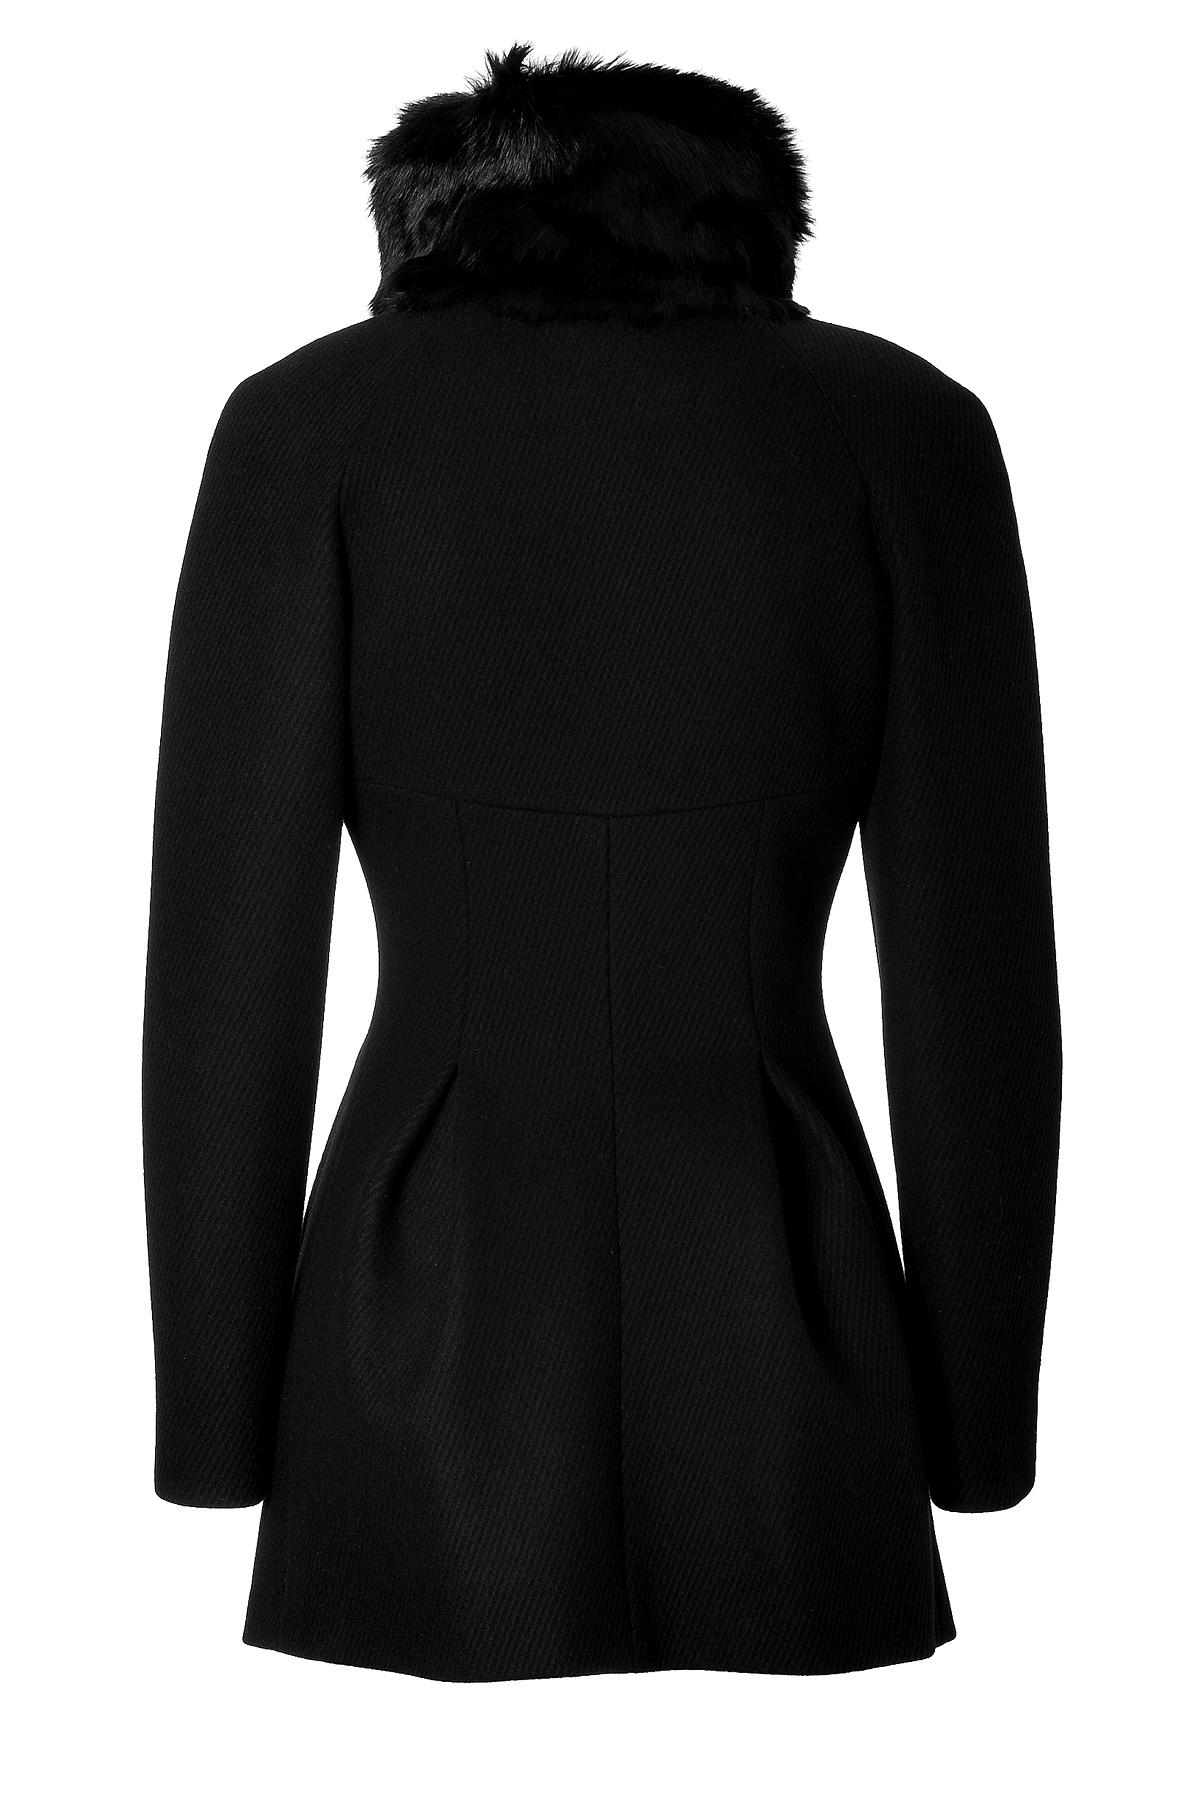 Women Long Black Wool Coat Fur Trim ($ - $2,): 30 of items - Shop Women Long Black Wool Coat Fur Trim from ALL your favorite stores & find HUGE SAVINGS up to 80% off Women Long Black Wool Coat Fur Trim, including GREAT DEALS like Trina Turk Macken Leather-Trim Wool-Blend Coat ($).